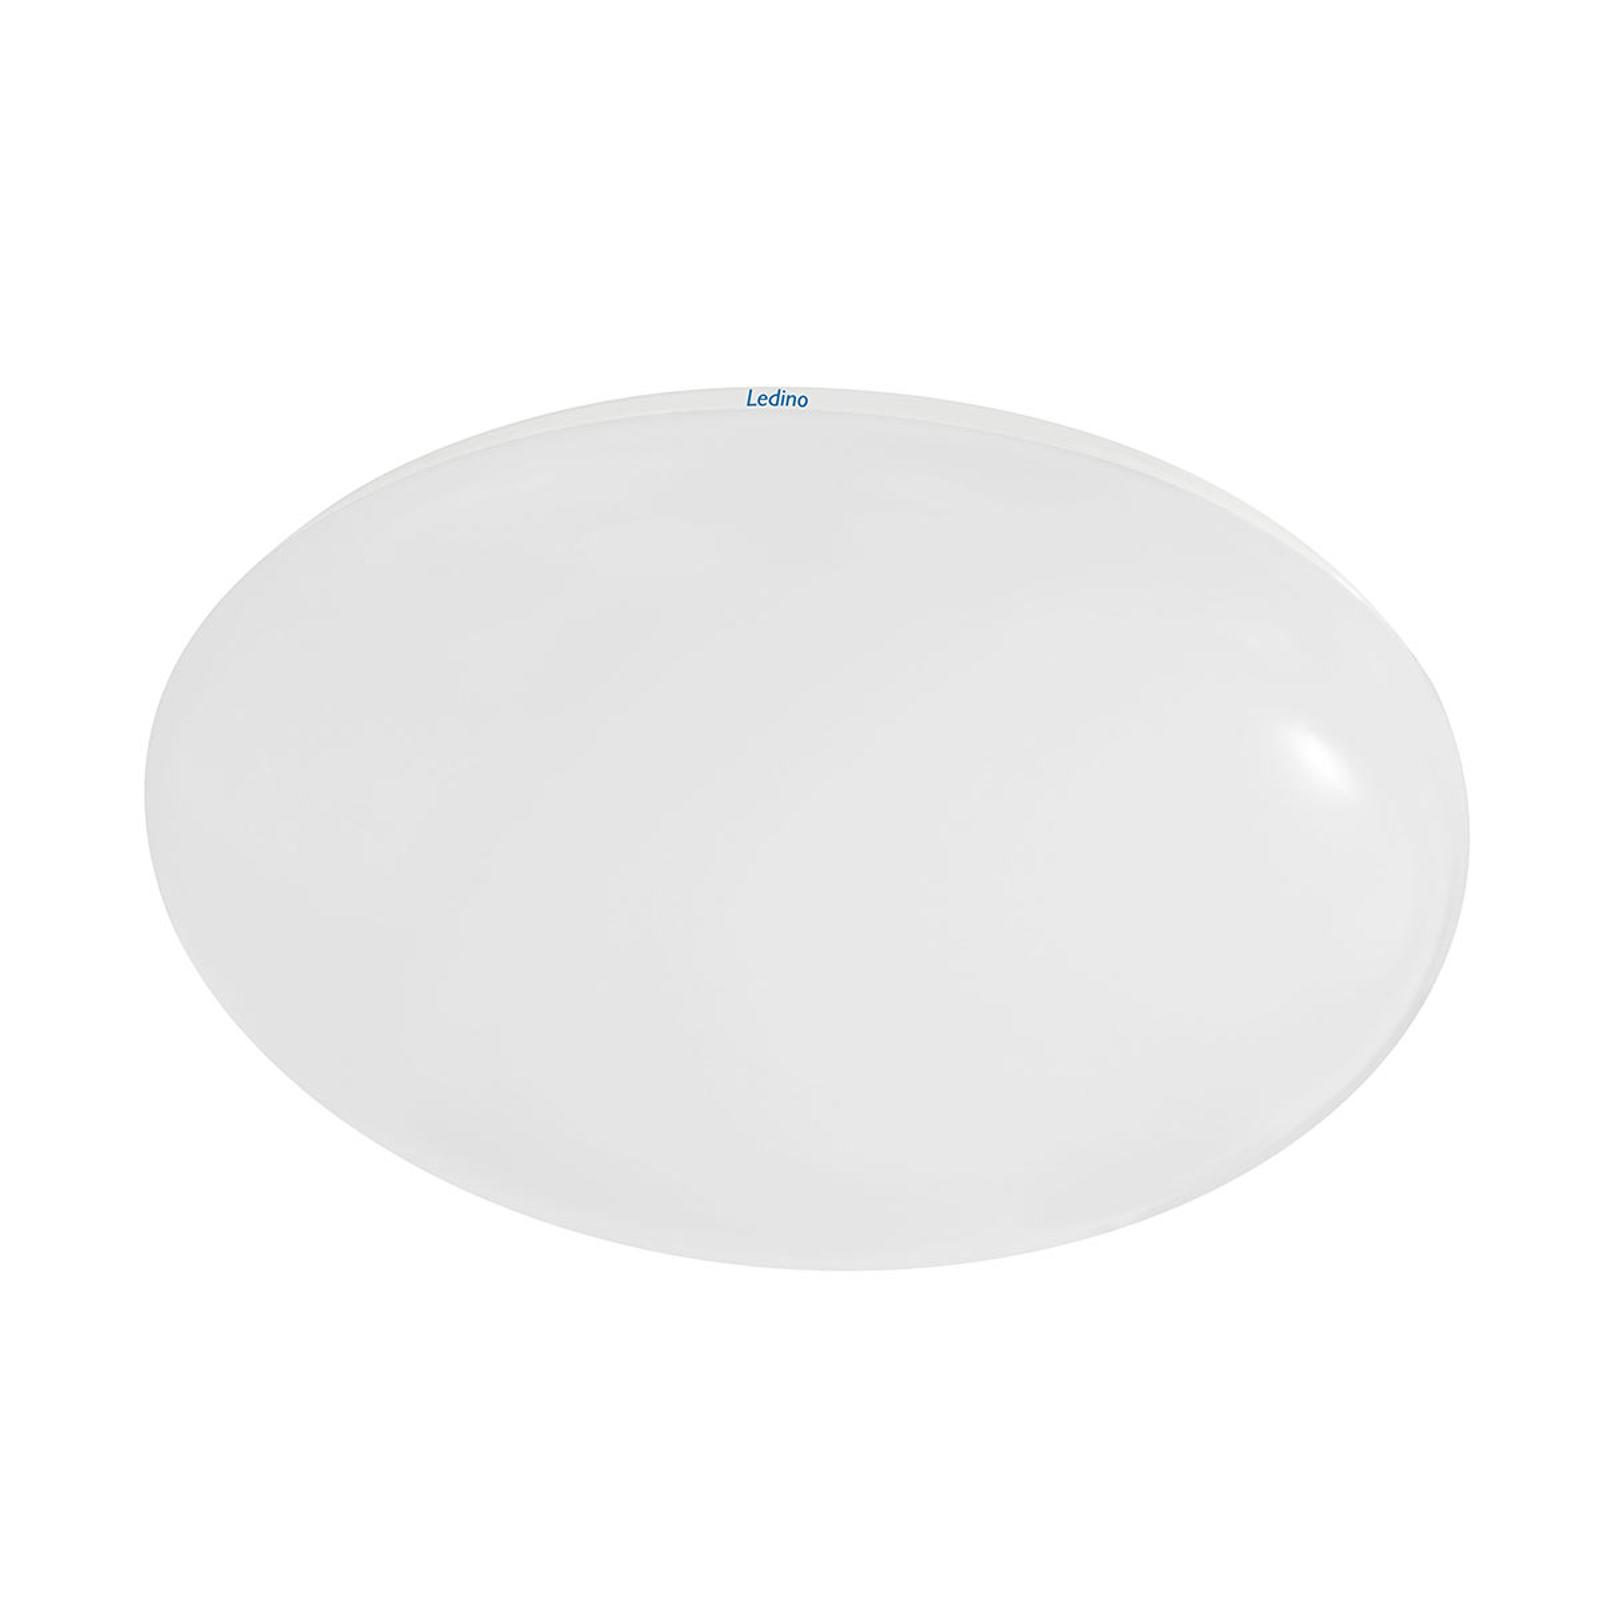 LED-Deckenleuchte Altona, Ø 27,6cm 950lm 4.000K